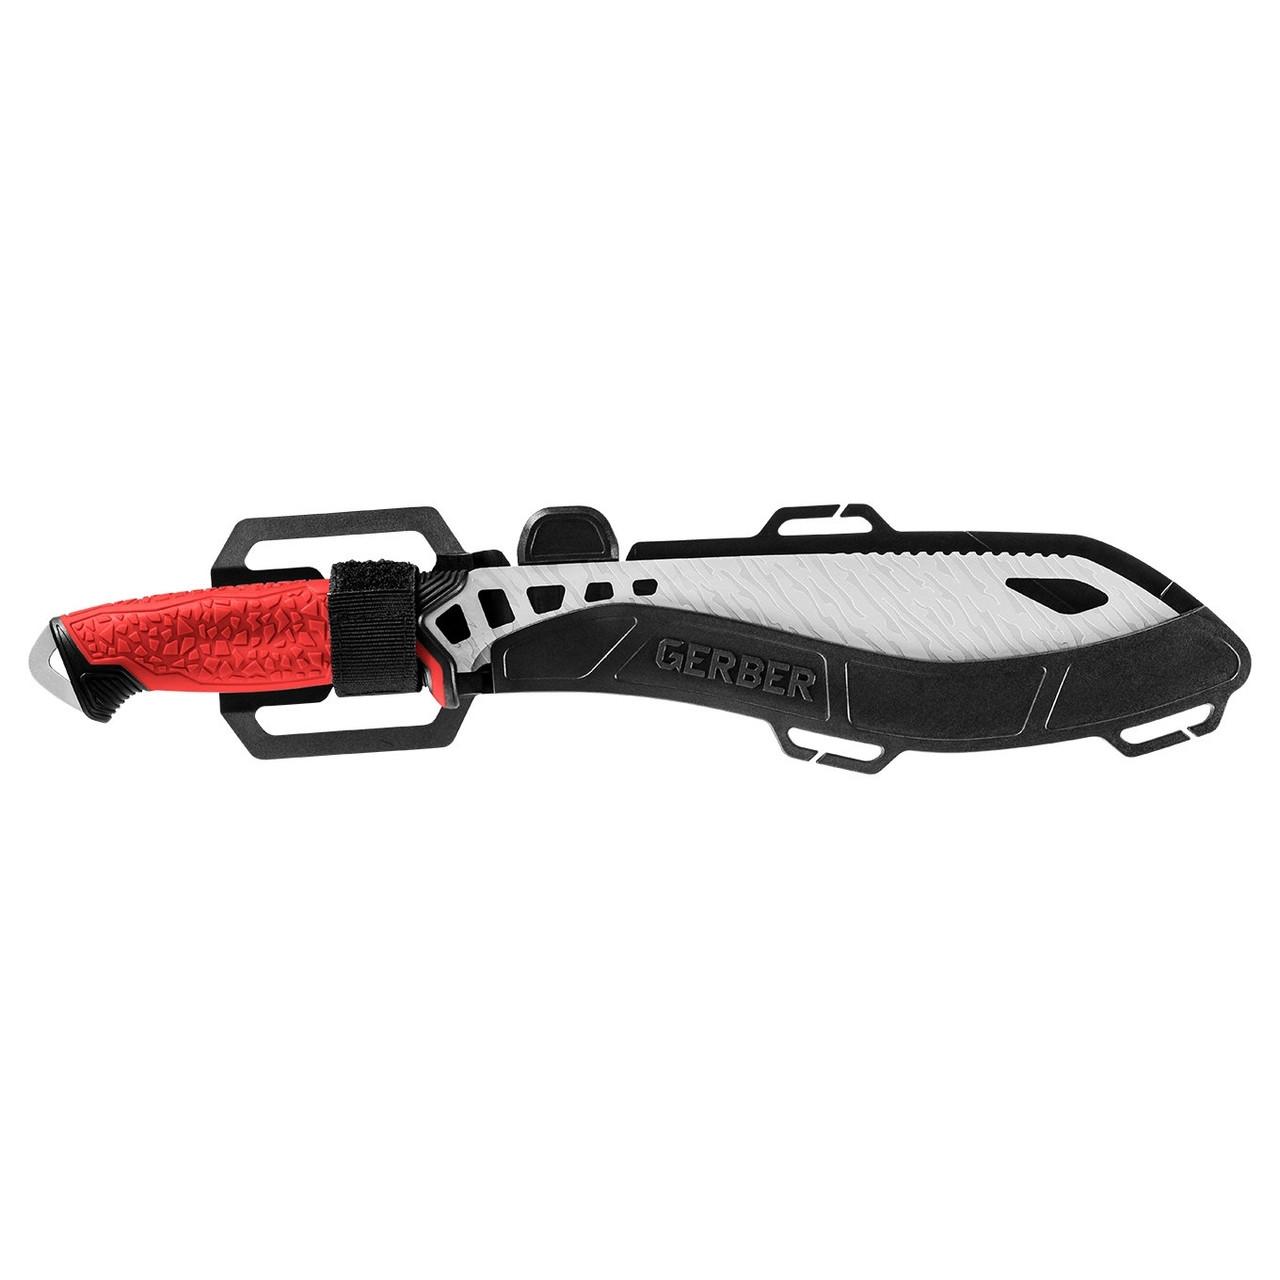 Gerber Red Versafix Pro Fixed Blade Knife, Bead Blast Blade SHEATH VIEW